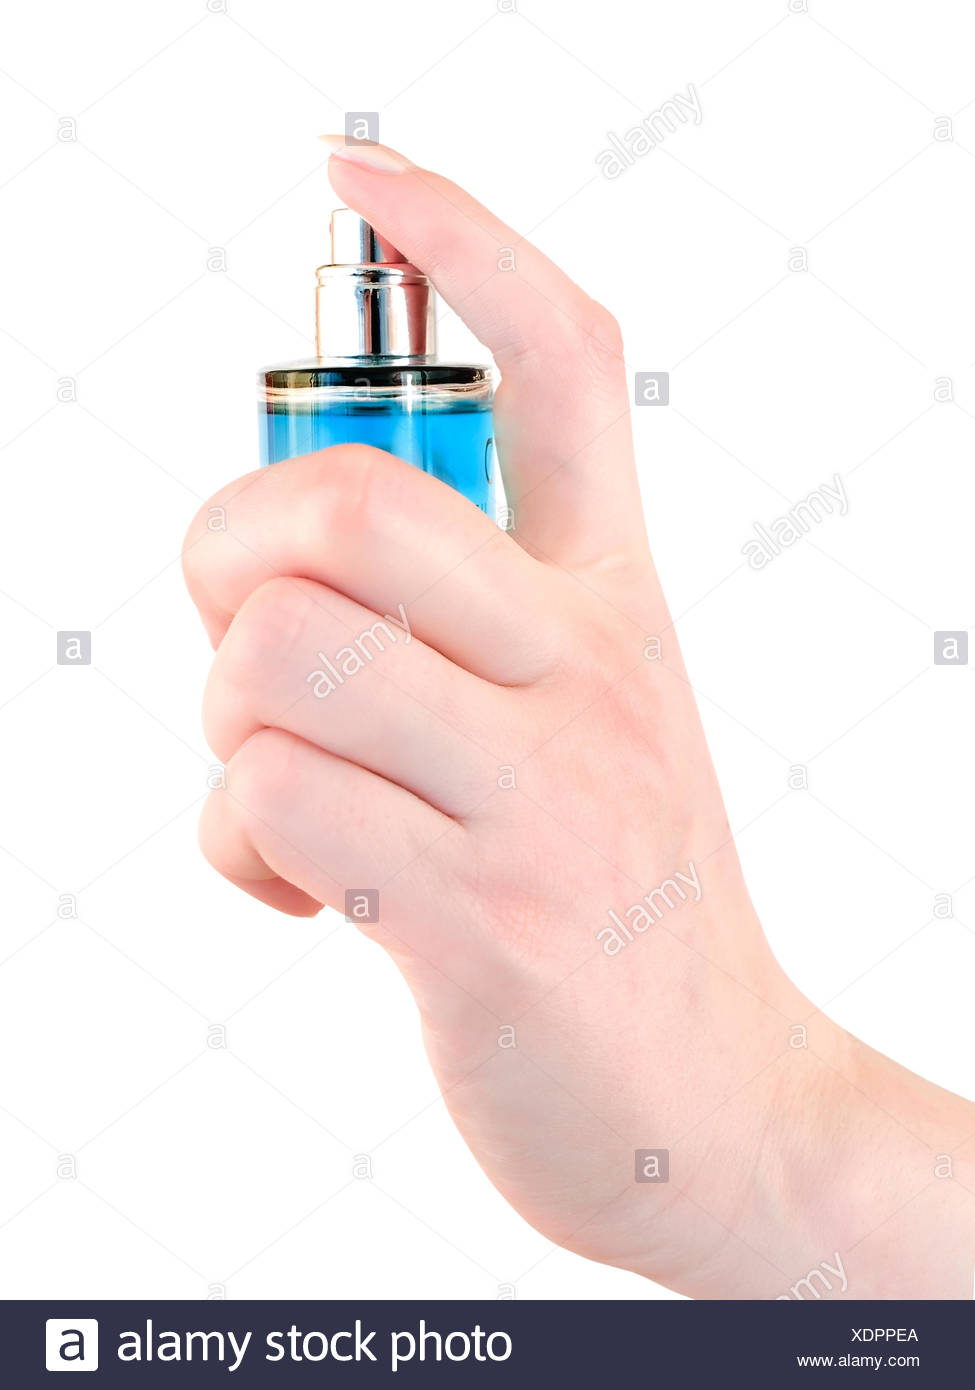 hand perfume spray - Stock Image